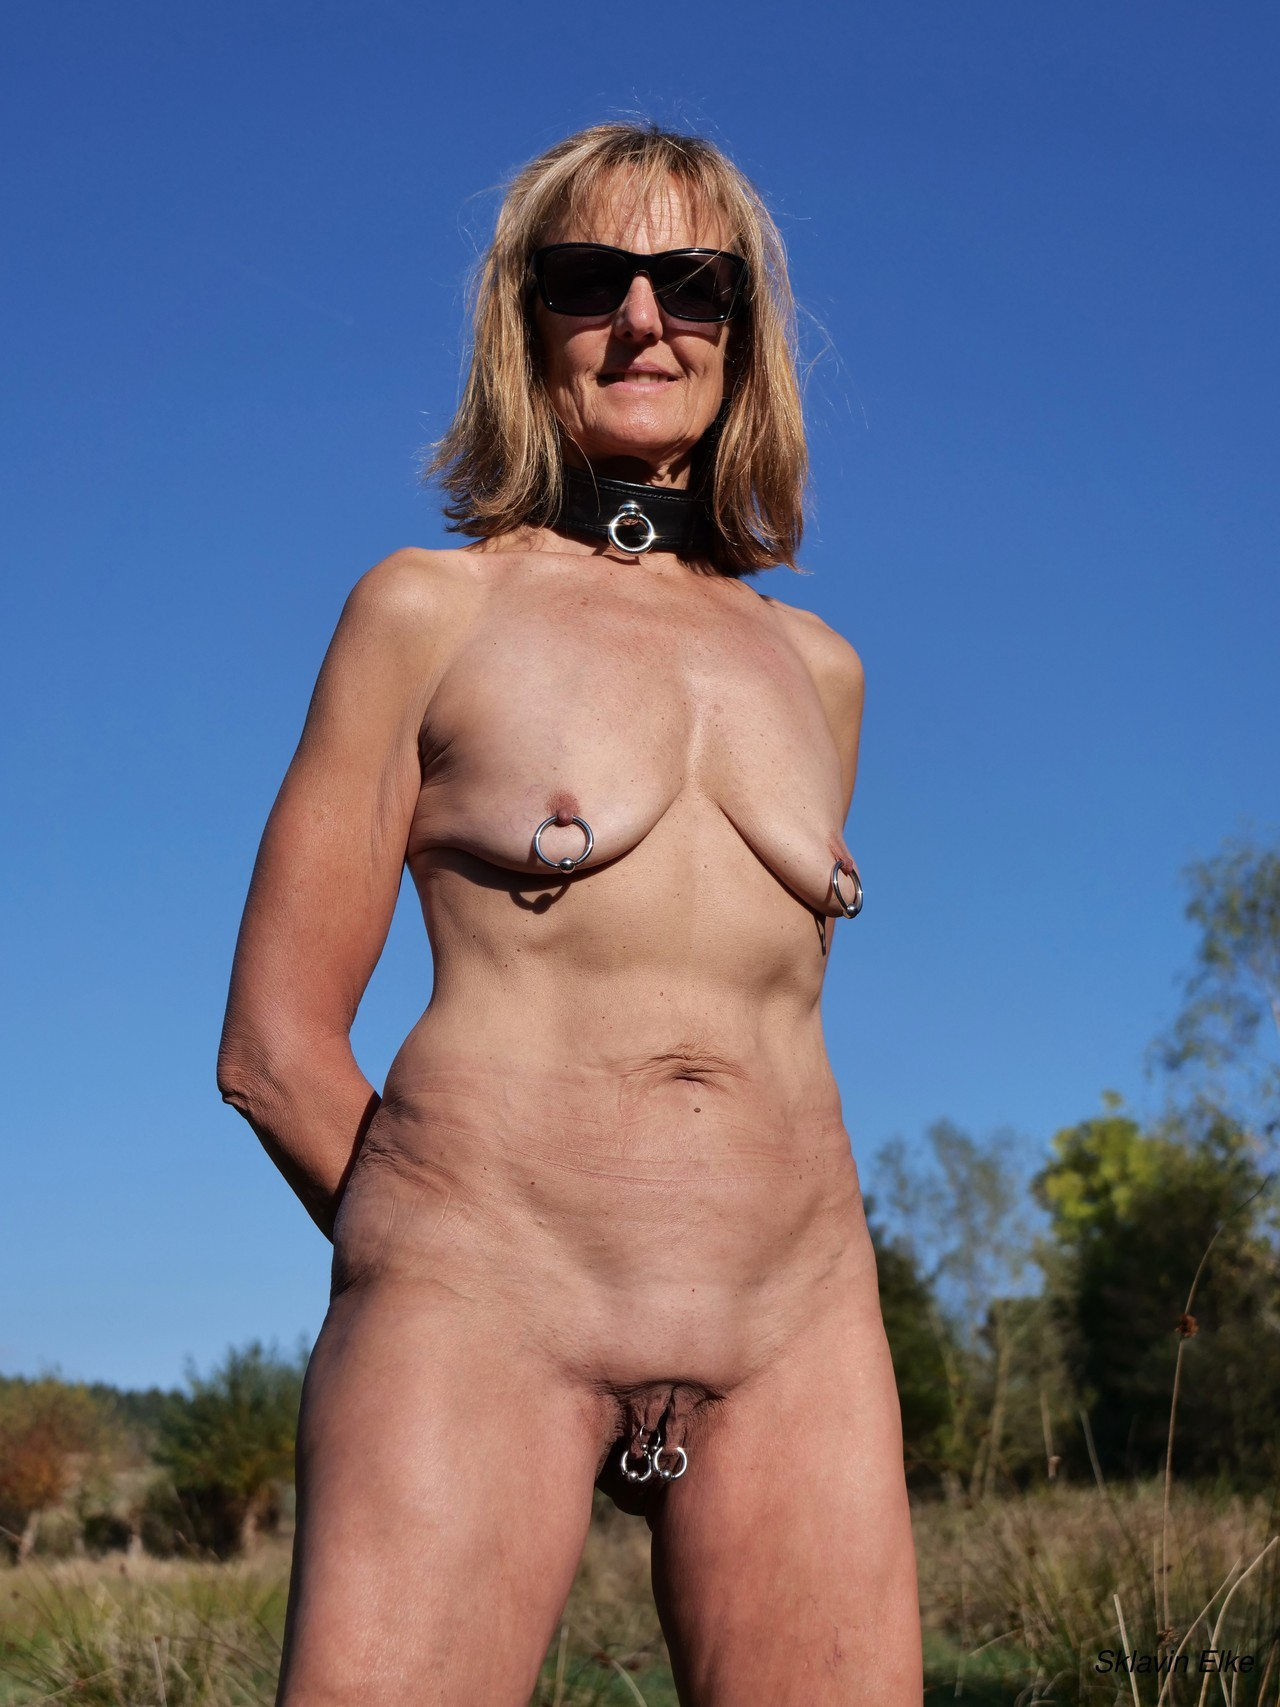 Chastity piercing tumblr suspended.accessdomain.com